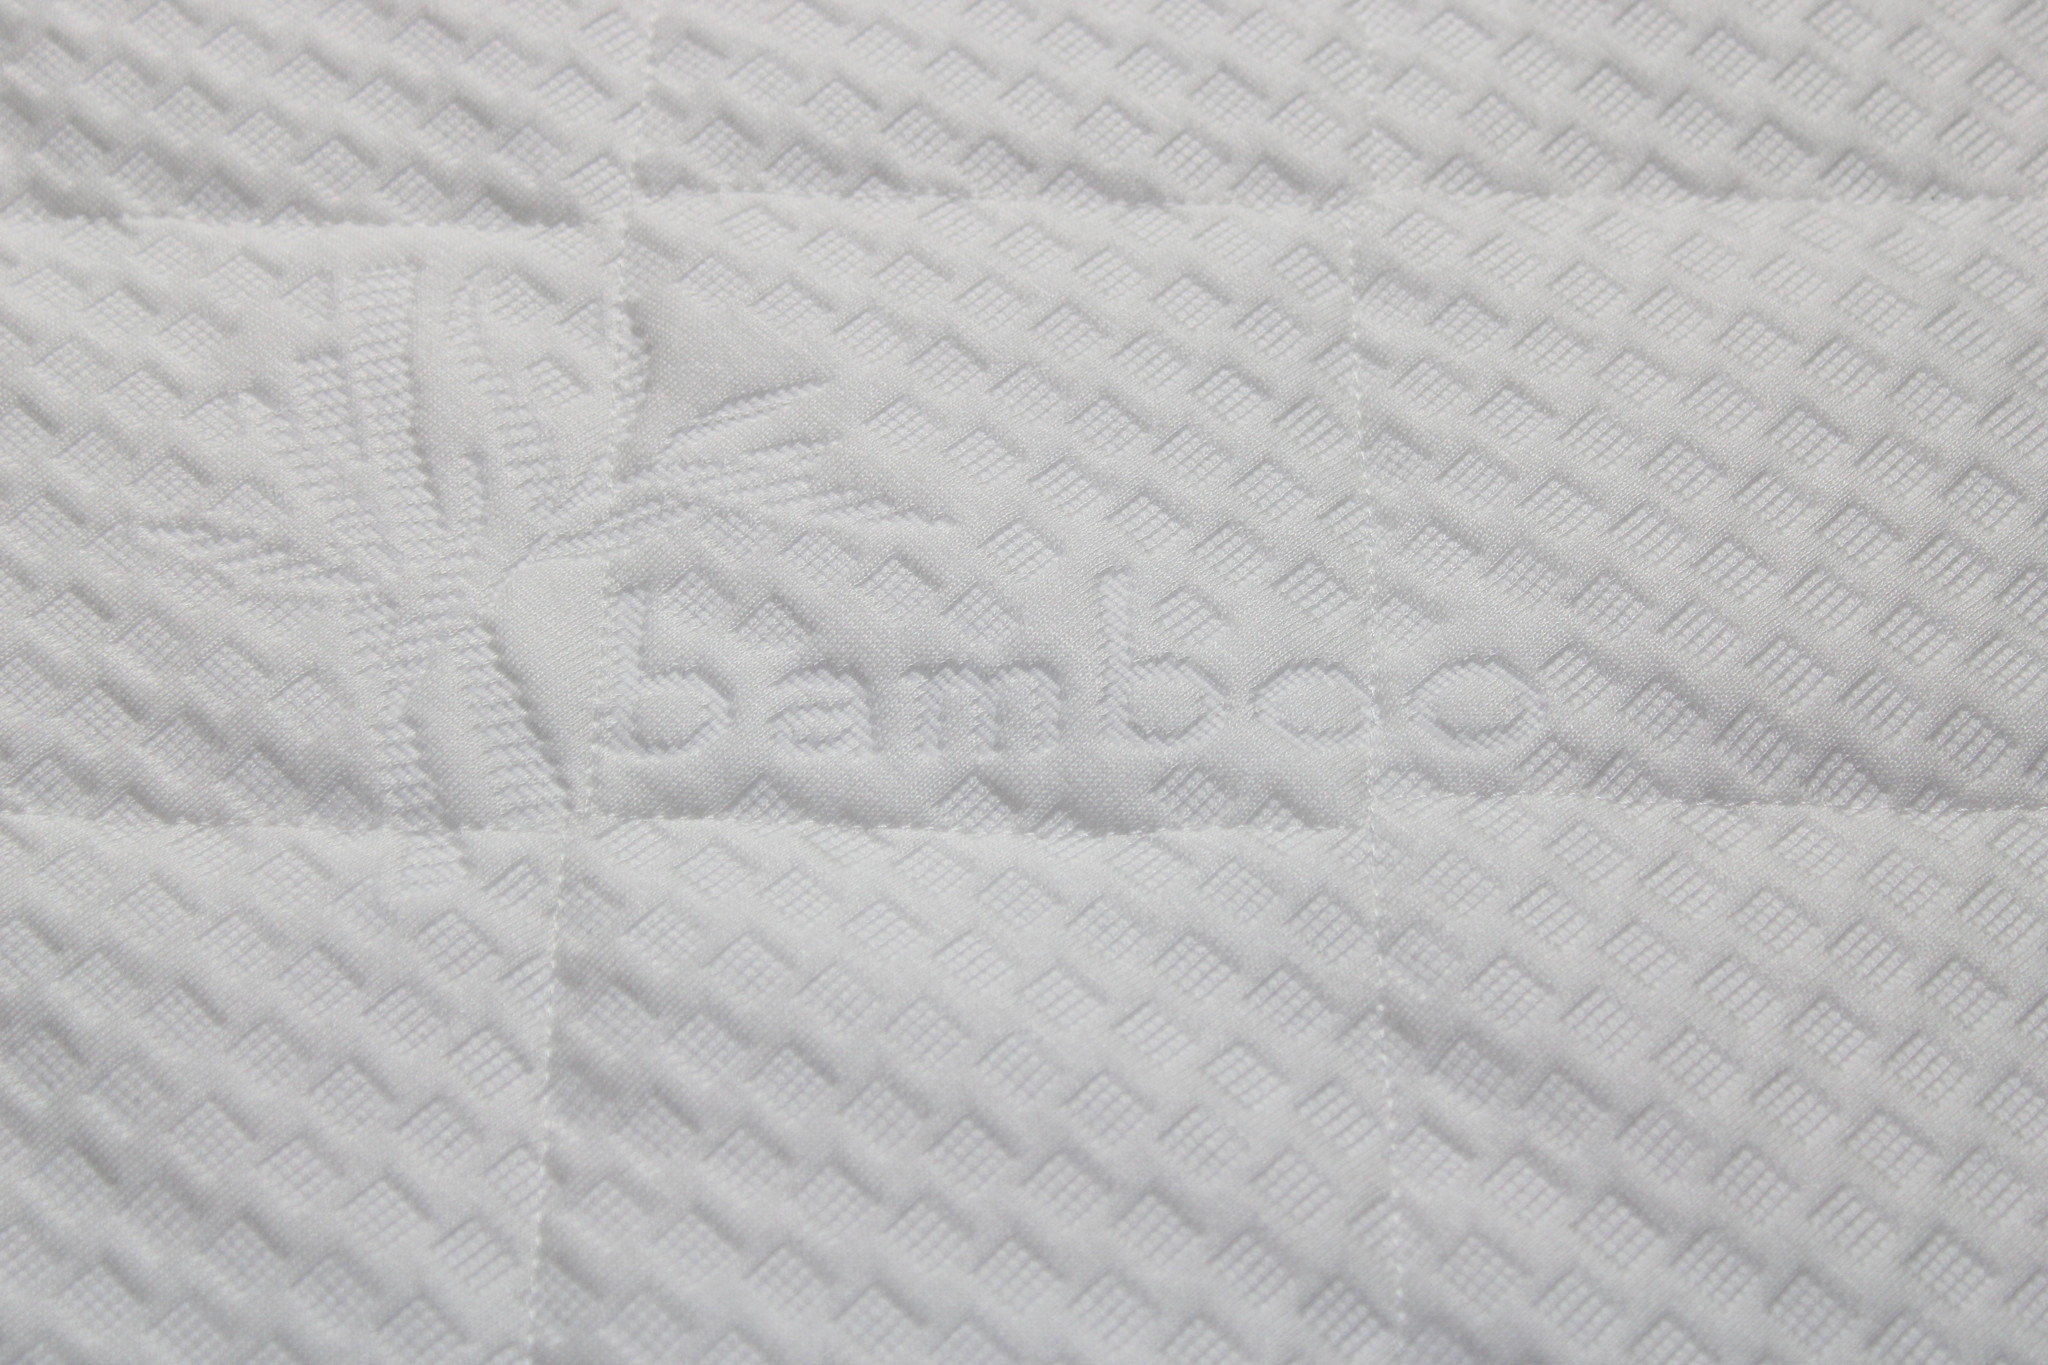 Sarpy Kindermatras 90x195 koudschuim hr40 bamboo